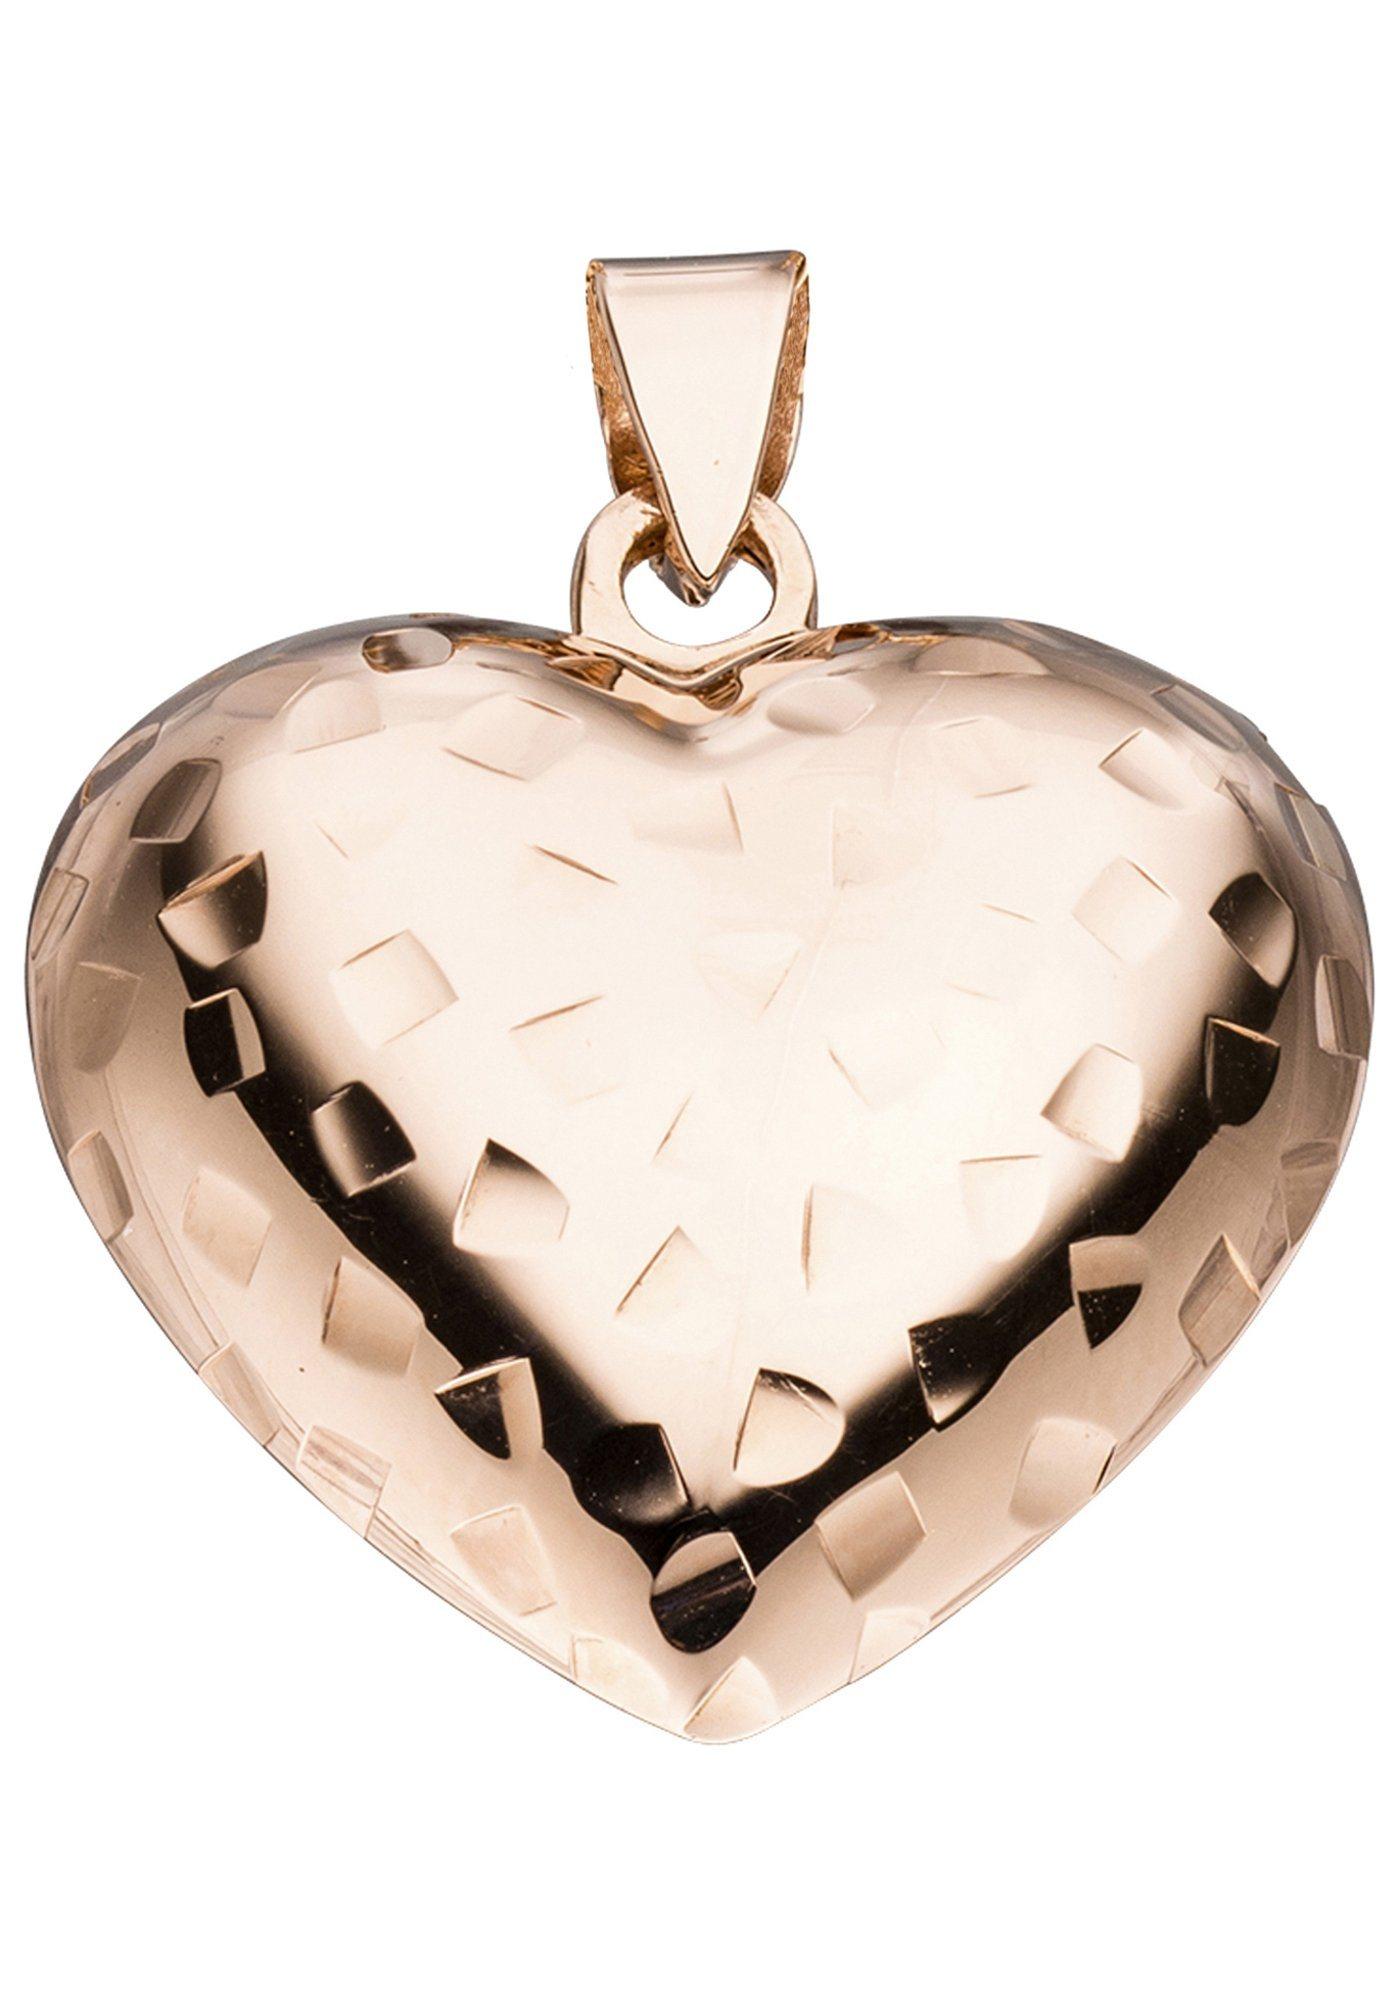 JOBO Herzanhänger »Herz« 925 Silber roségold vergoldet | Schmuck > Halsketten > Herzketten | Silber | JOBO